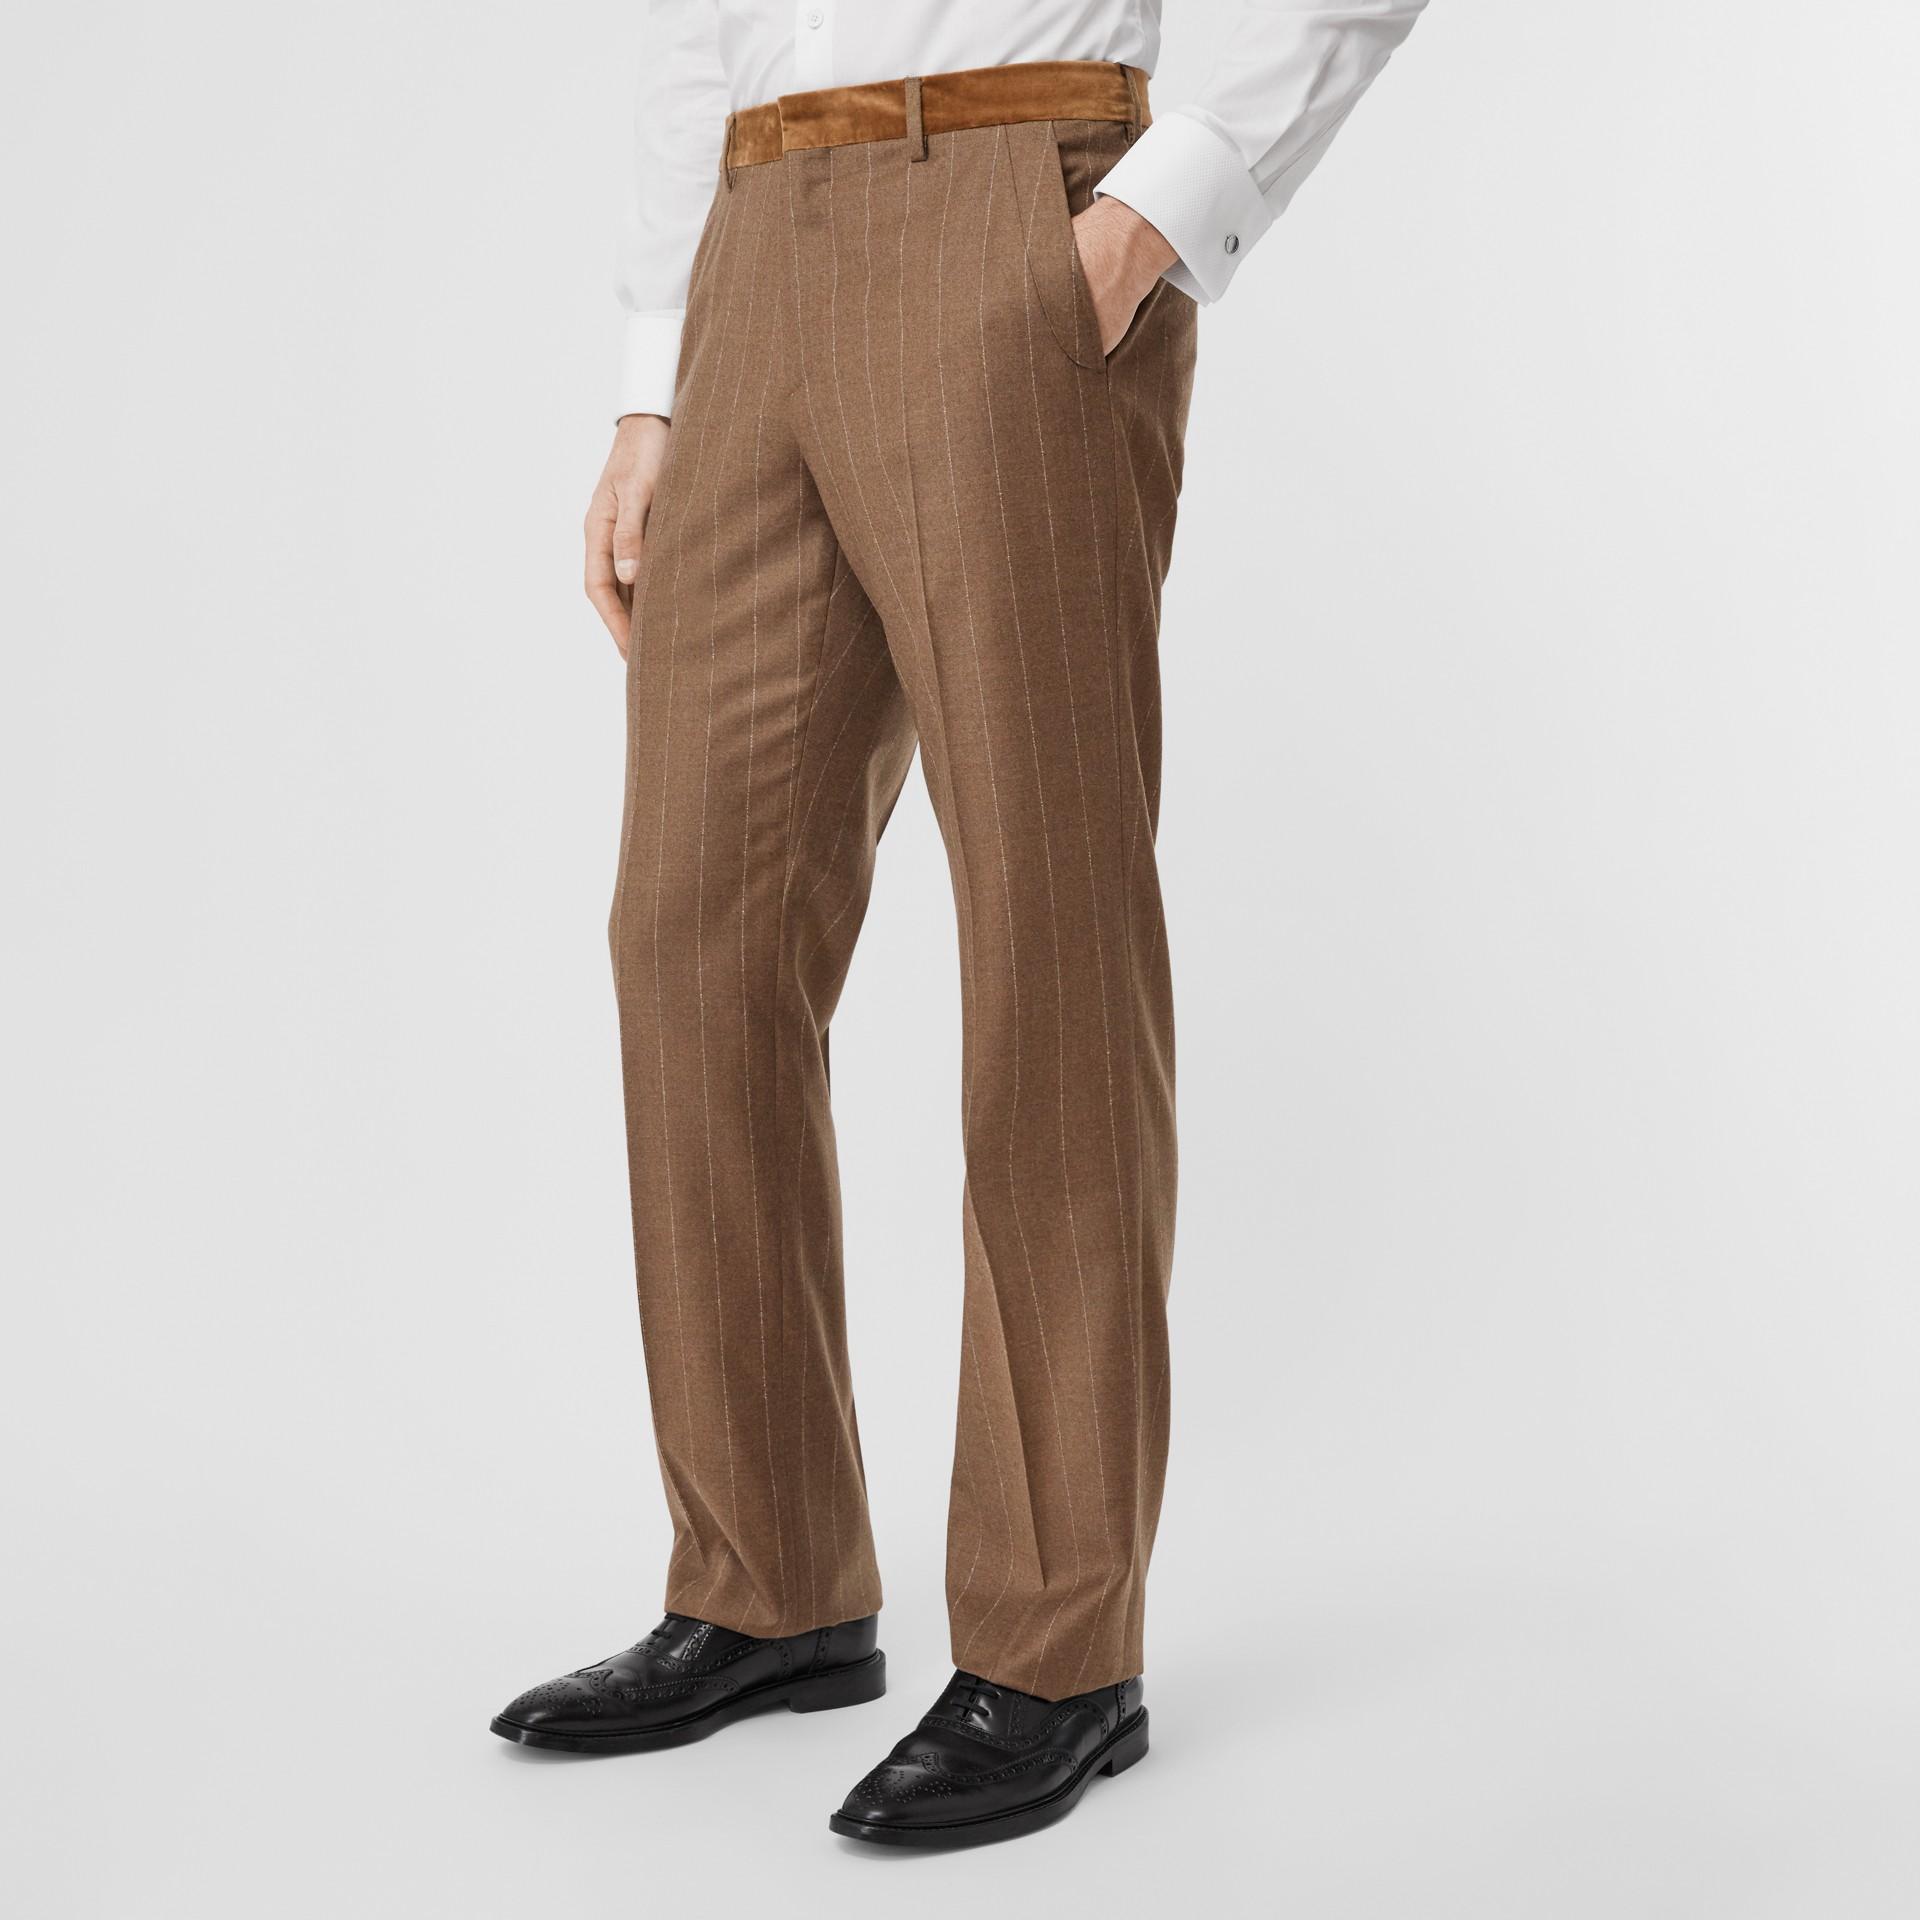 Classic Fit Velvet Trim Wool Cashmere Trousers in Dark Tan - Men | Burberry - gallery image 4